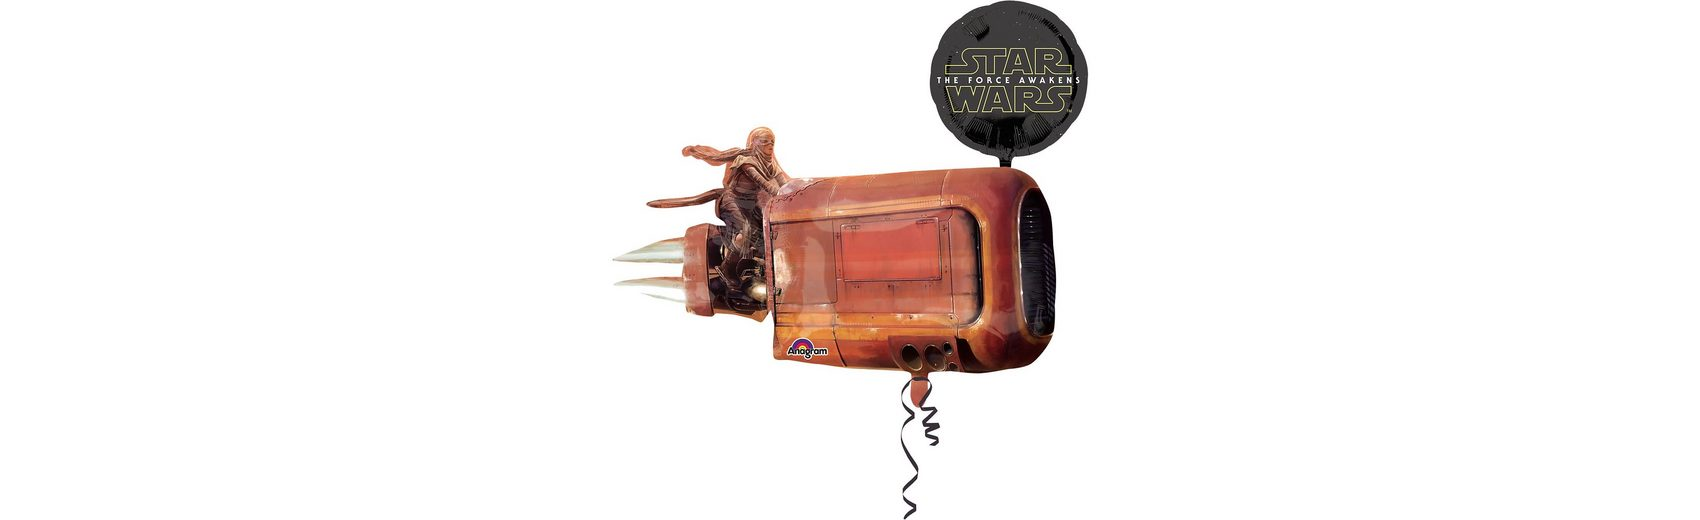 Amscan Folienballon Multi-Ballon Star Wars Das Erwachen der Macht